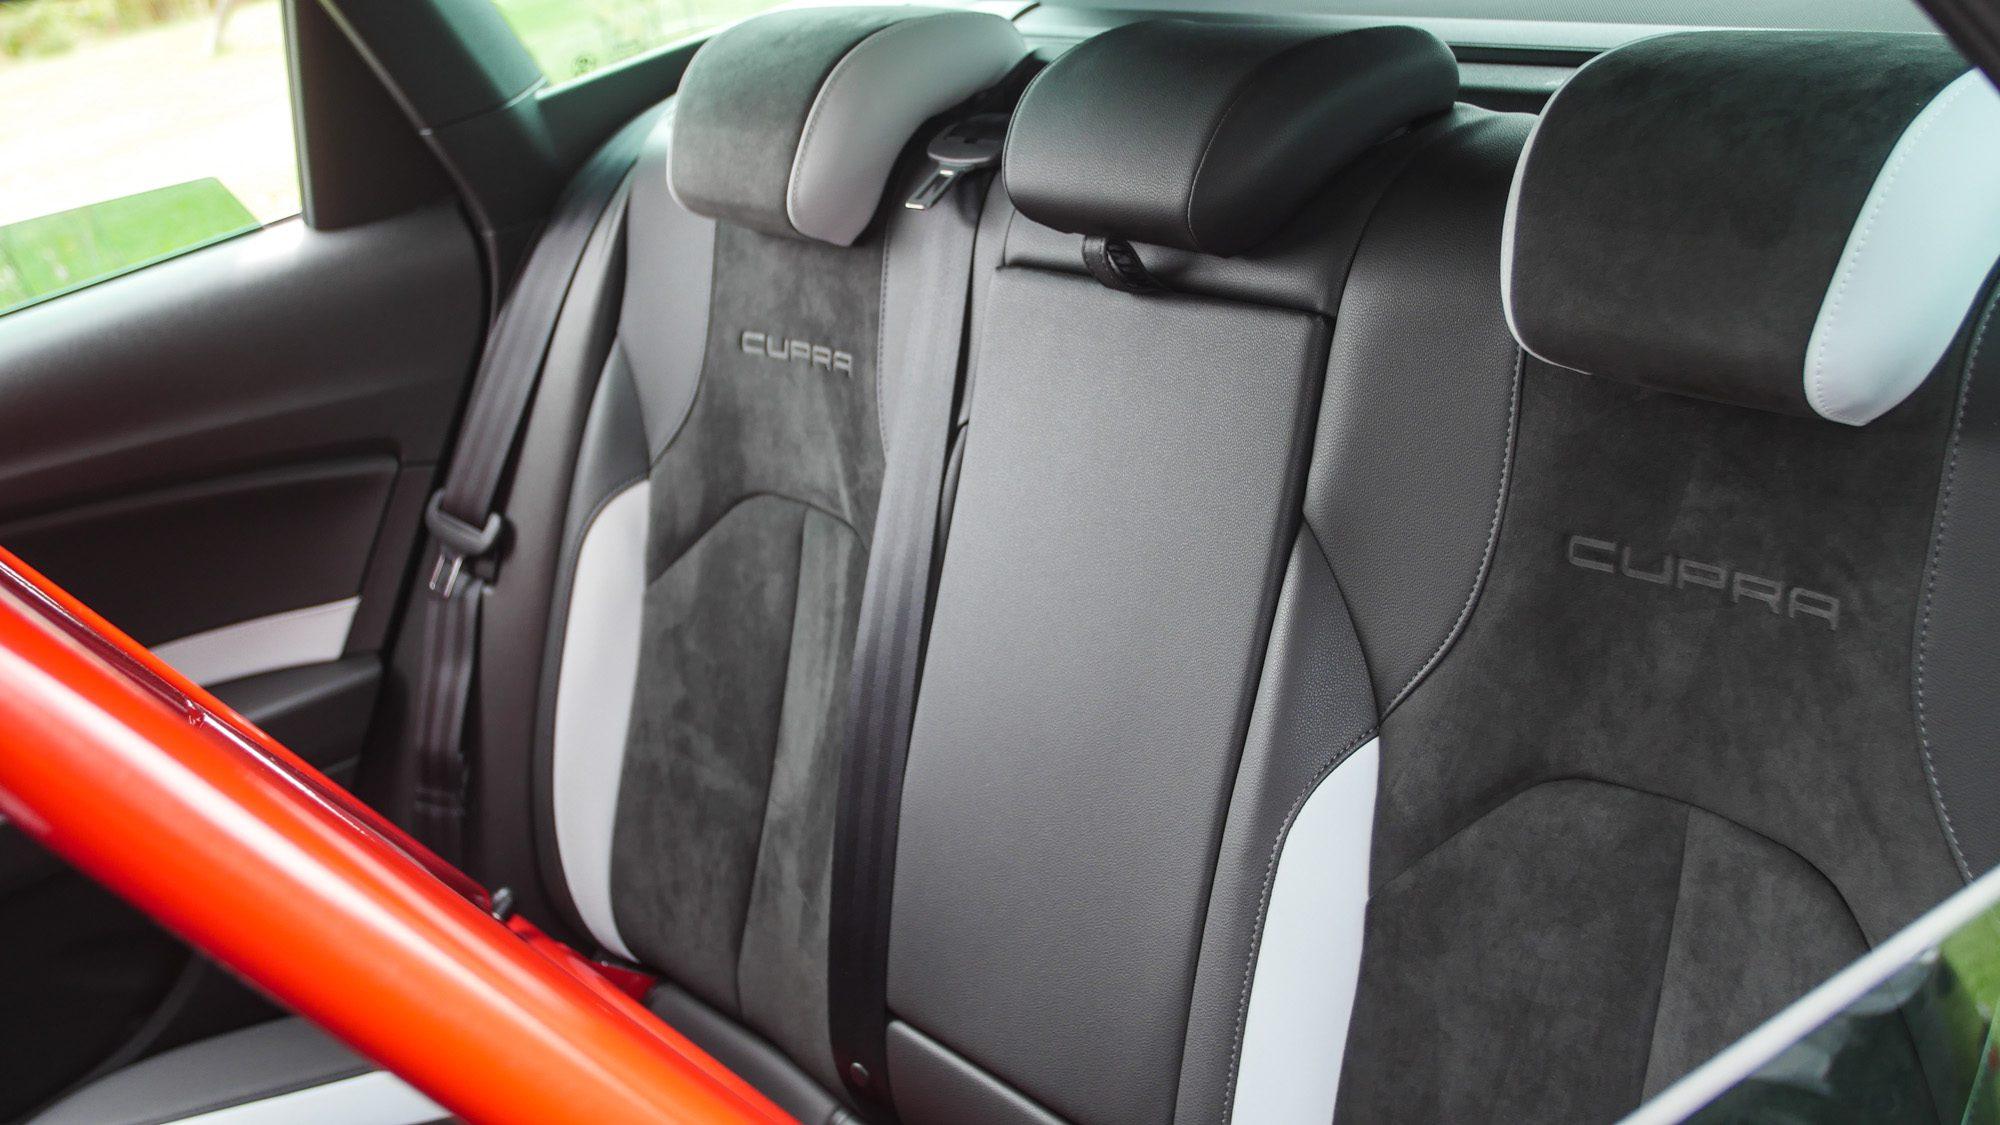 Edle Leder-Alcantara-Sitze im Fond des Seat Leon ST Cupra